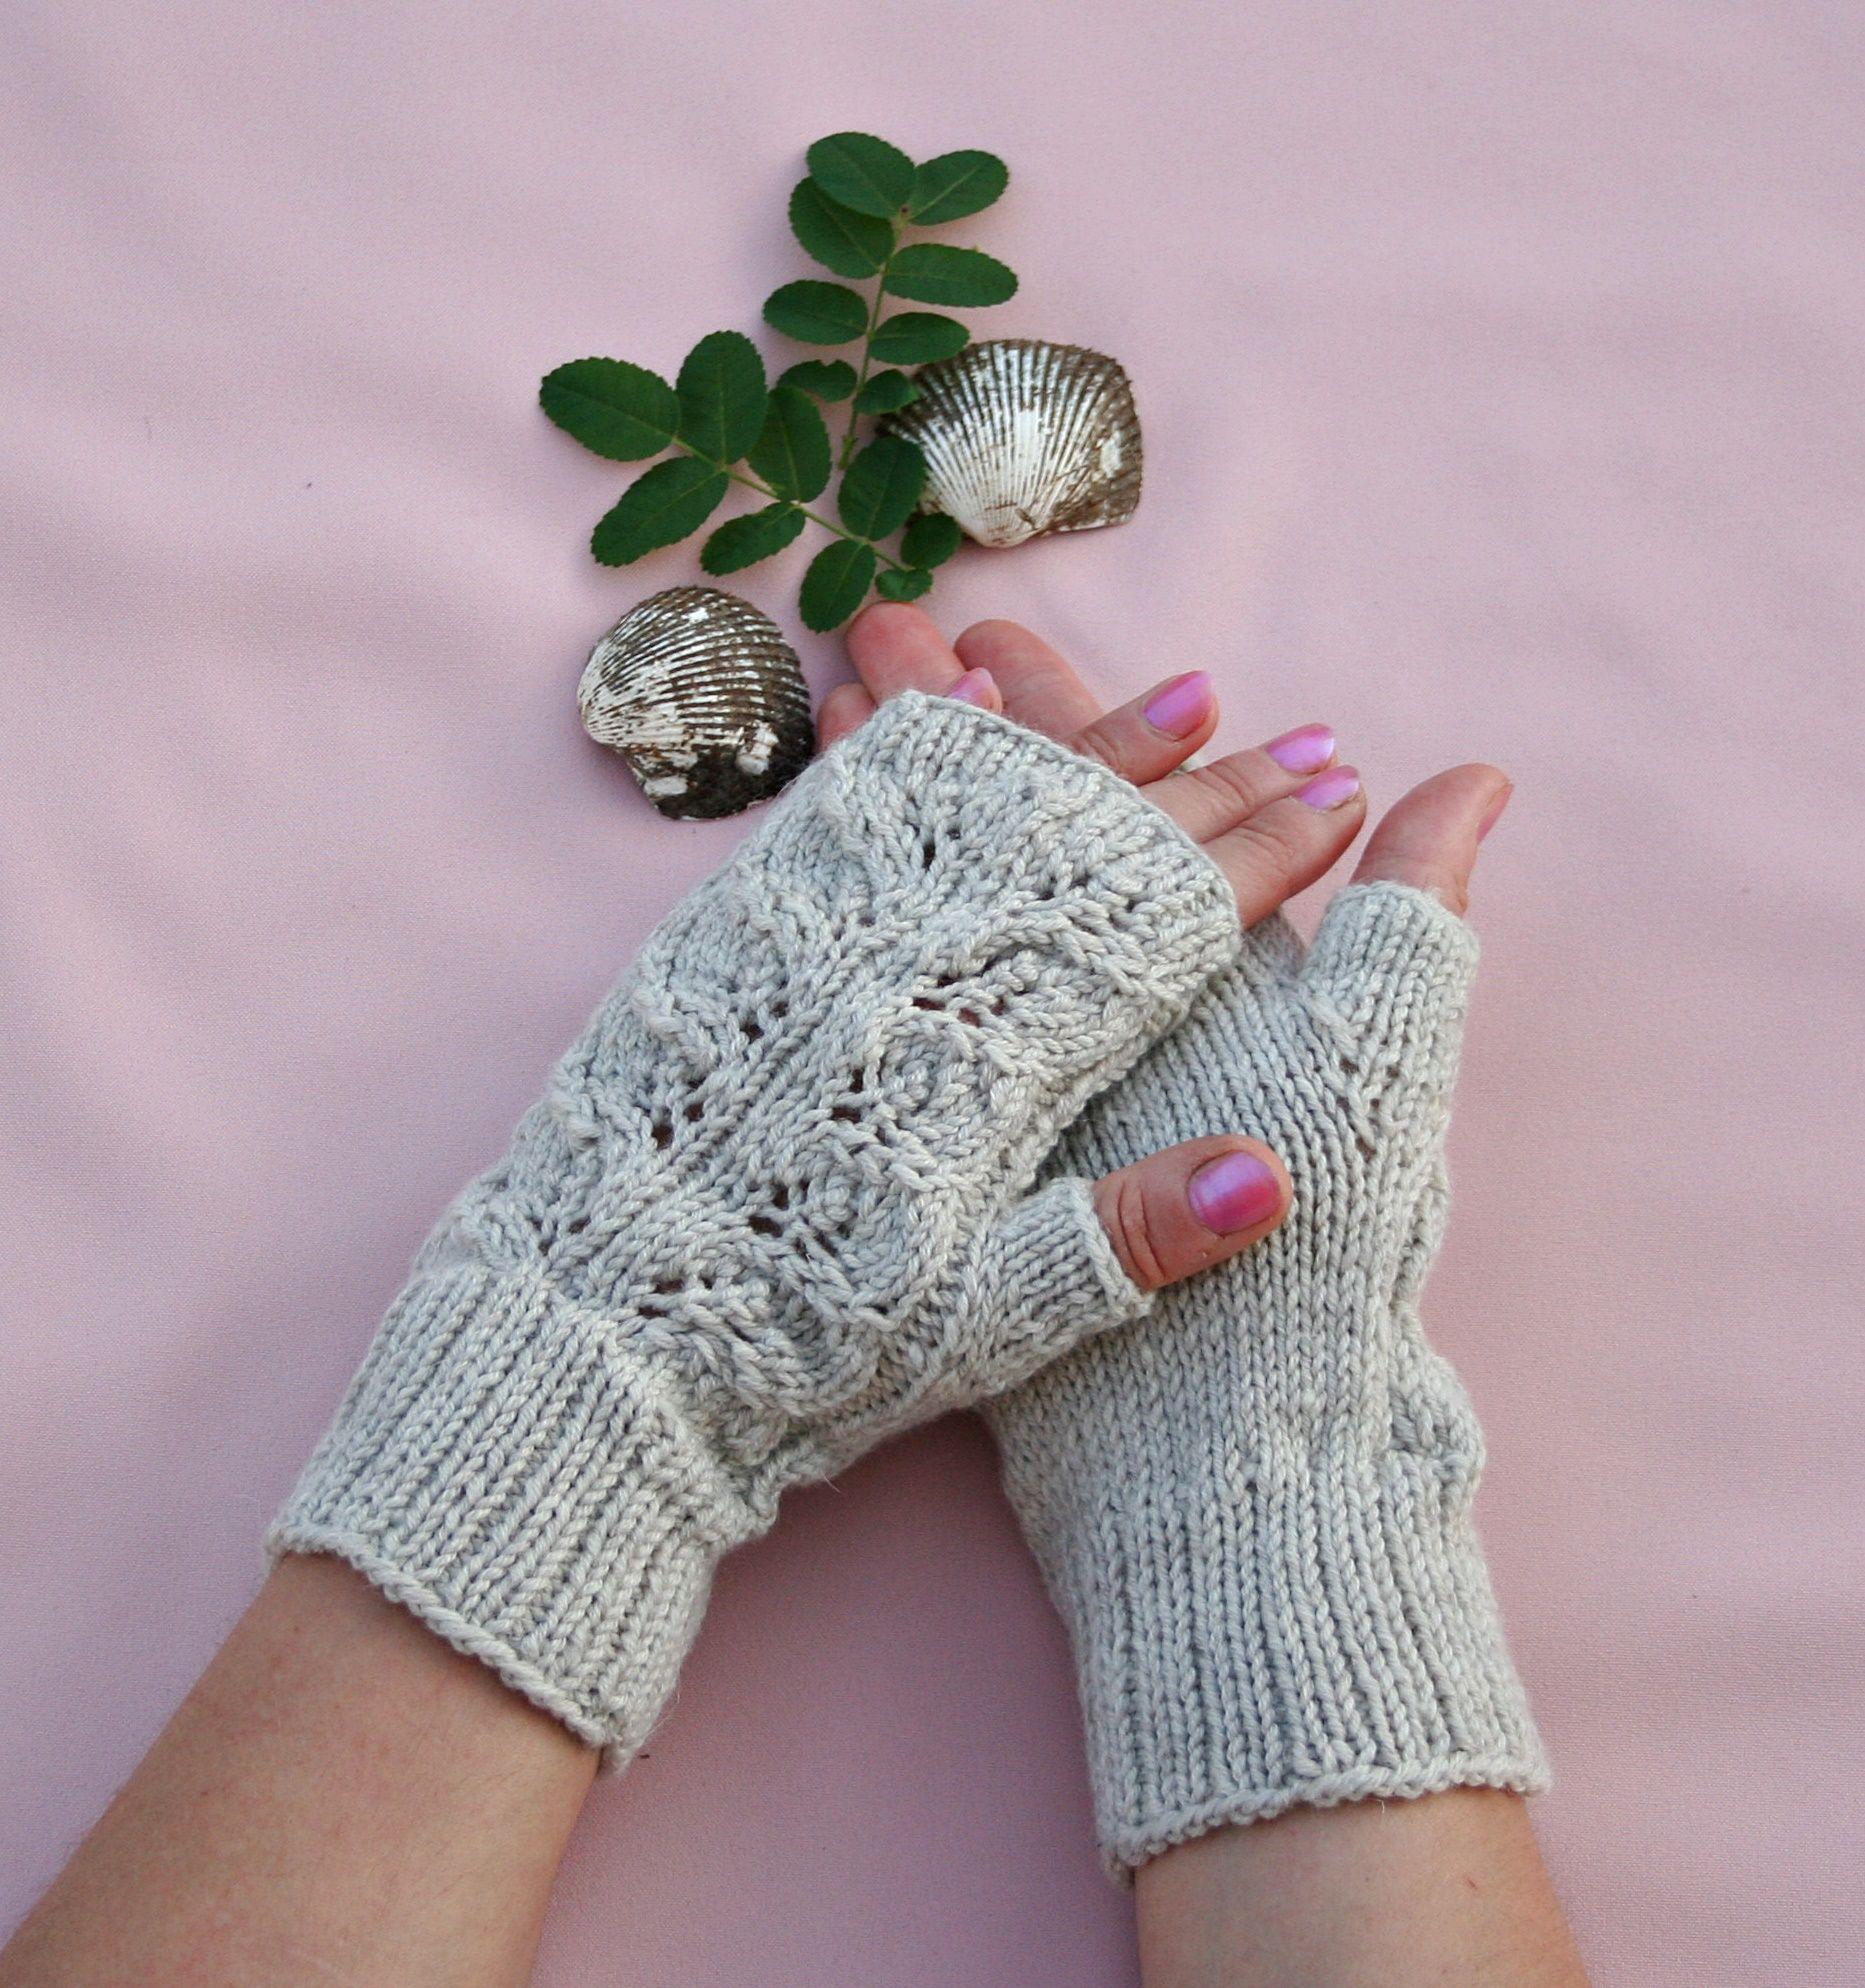 Drops lace pattern 146-27. Merino wool yarn is soft and skin ...